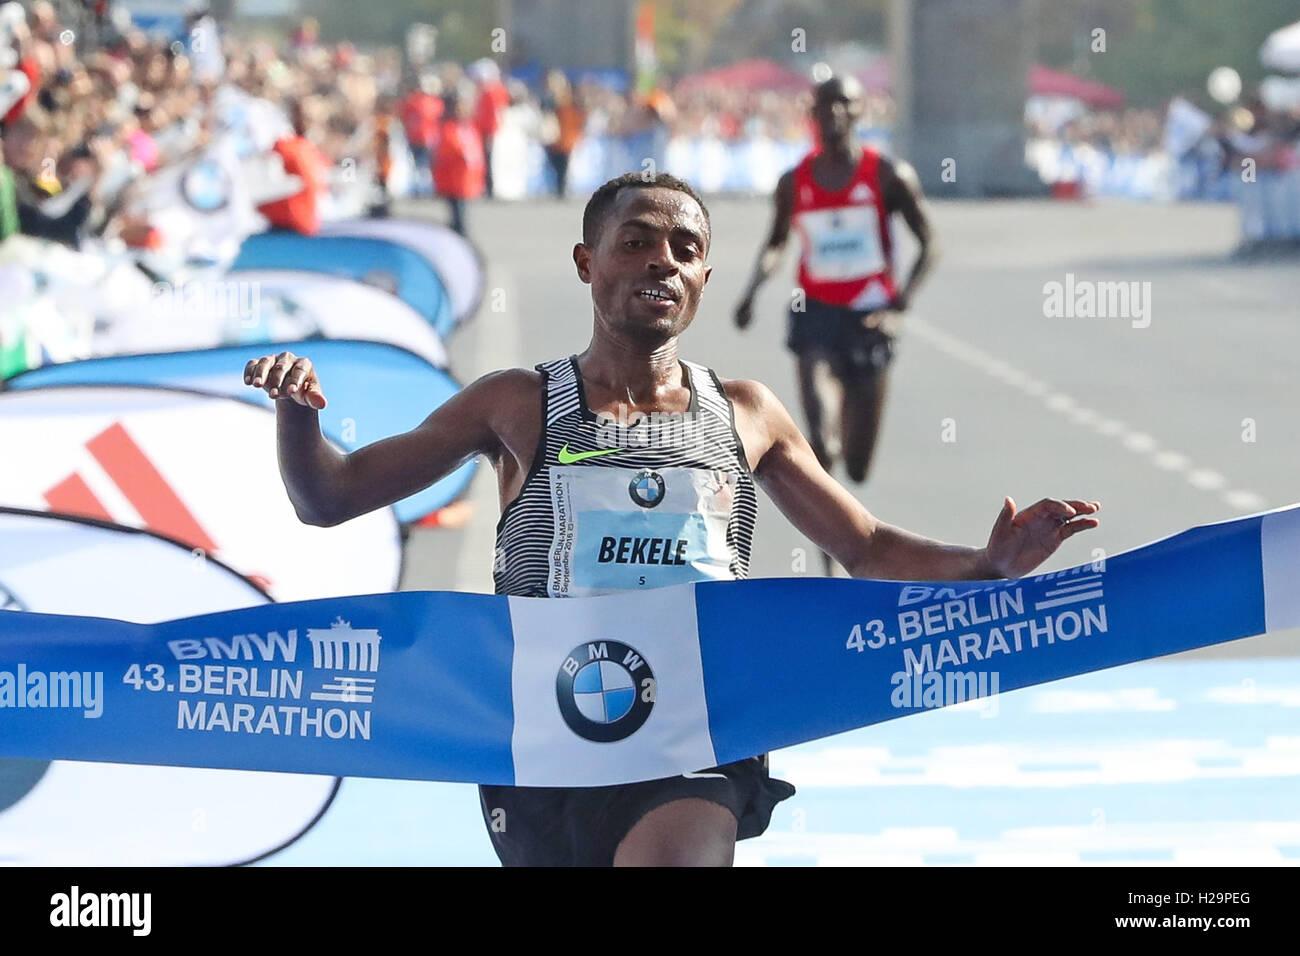 Berlín, Alemania. 25 Sep, 2016. Kenenisa Bekele (ETH) ganó la 43ª Maratón de Berlín, celebrada Imagen De Stock